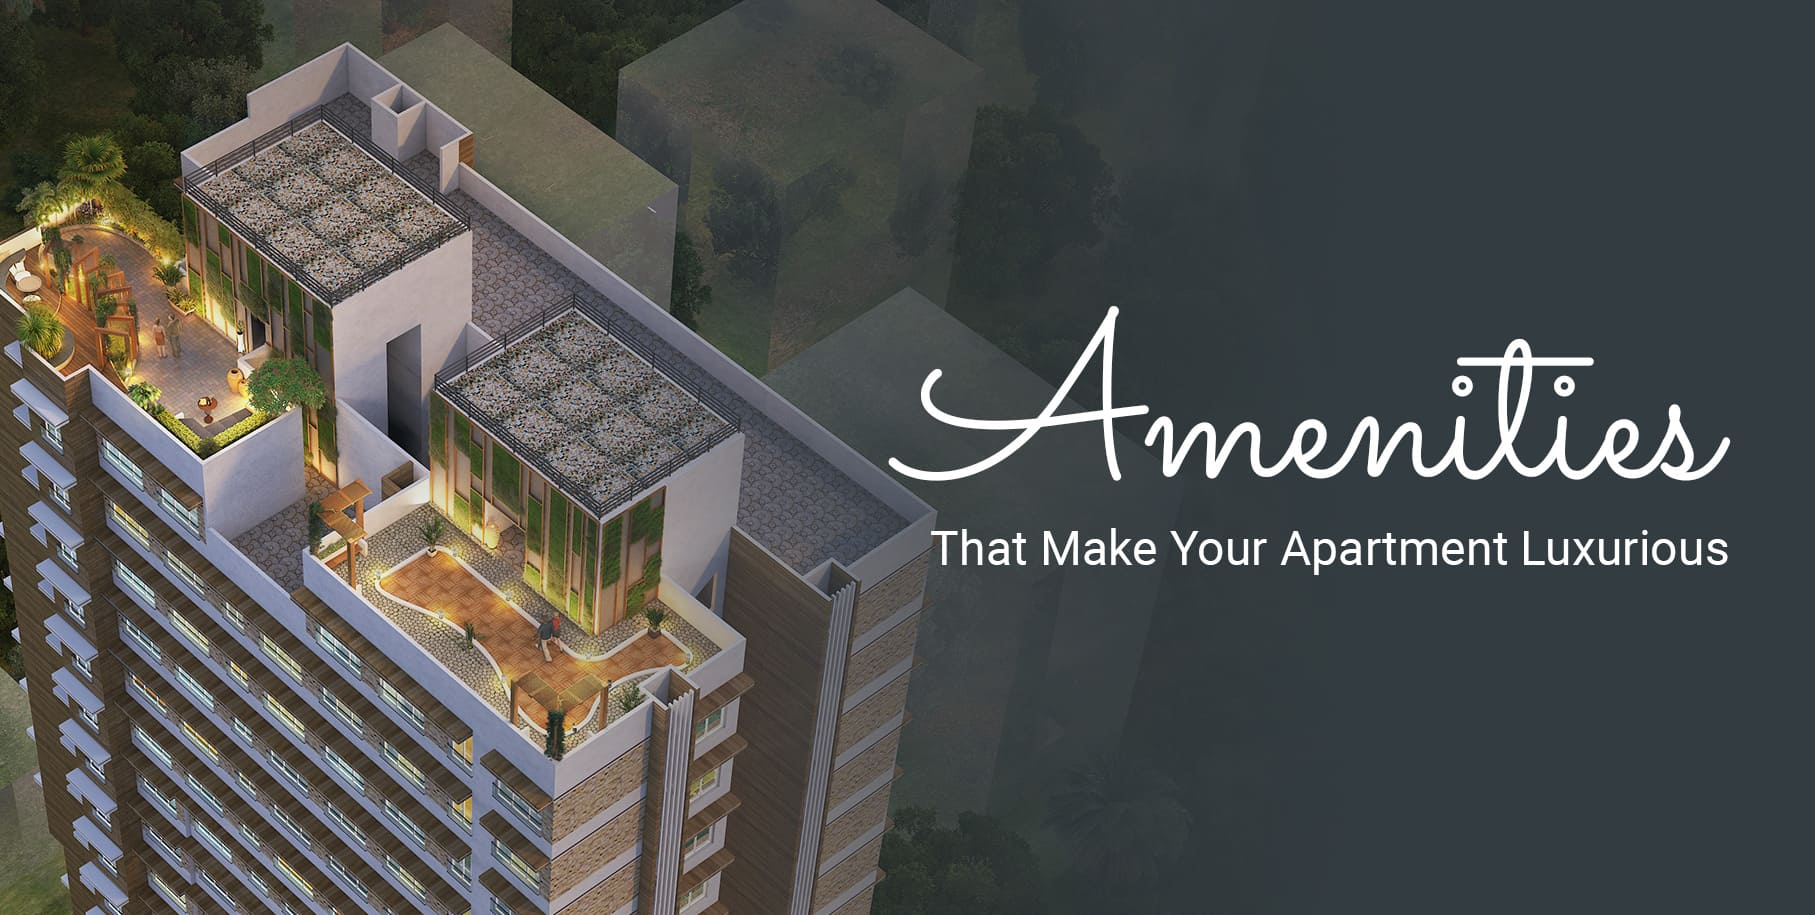 Amenities – That Make Your Apartment Luxurious in Mumbai